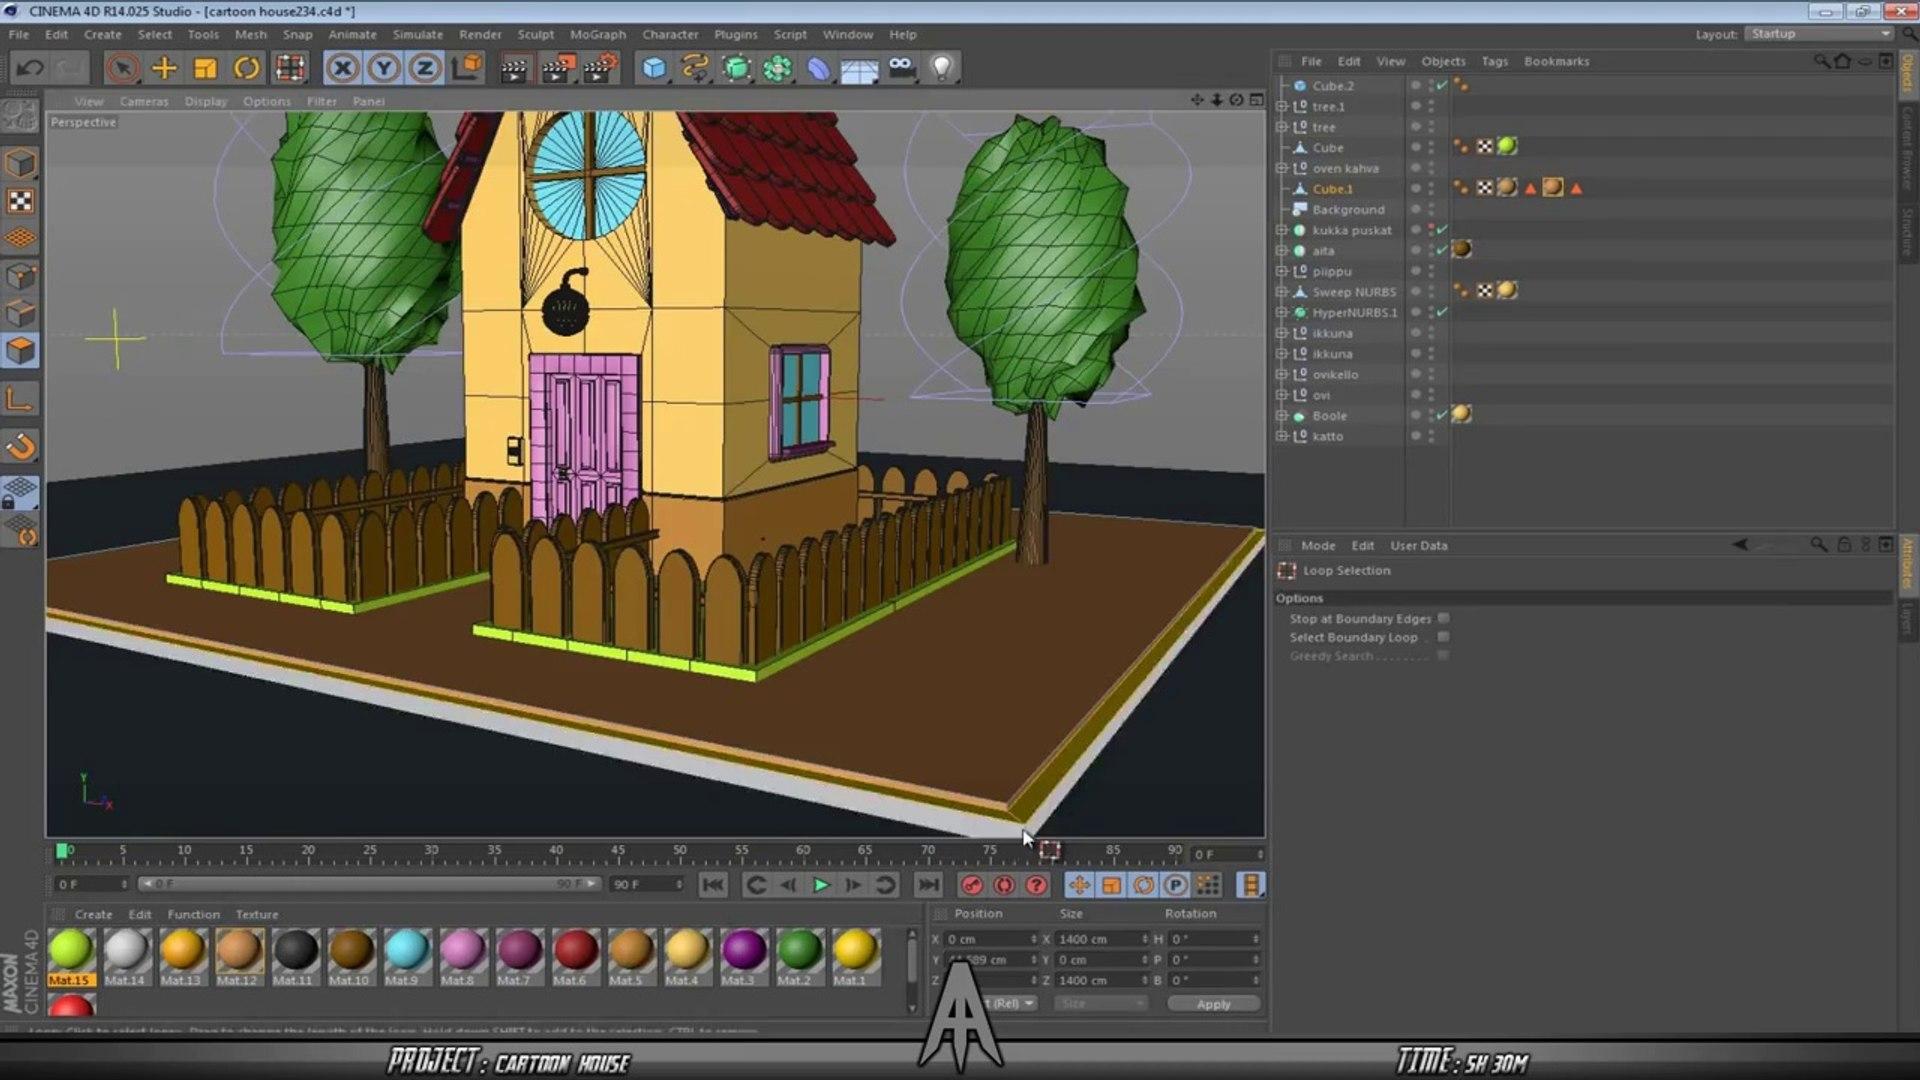 Cinema 4D - Speed Modeling - Cartoon House